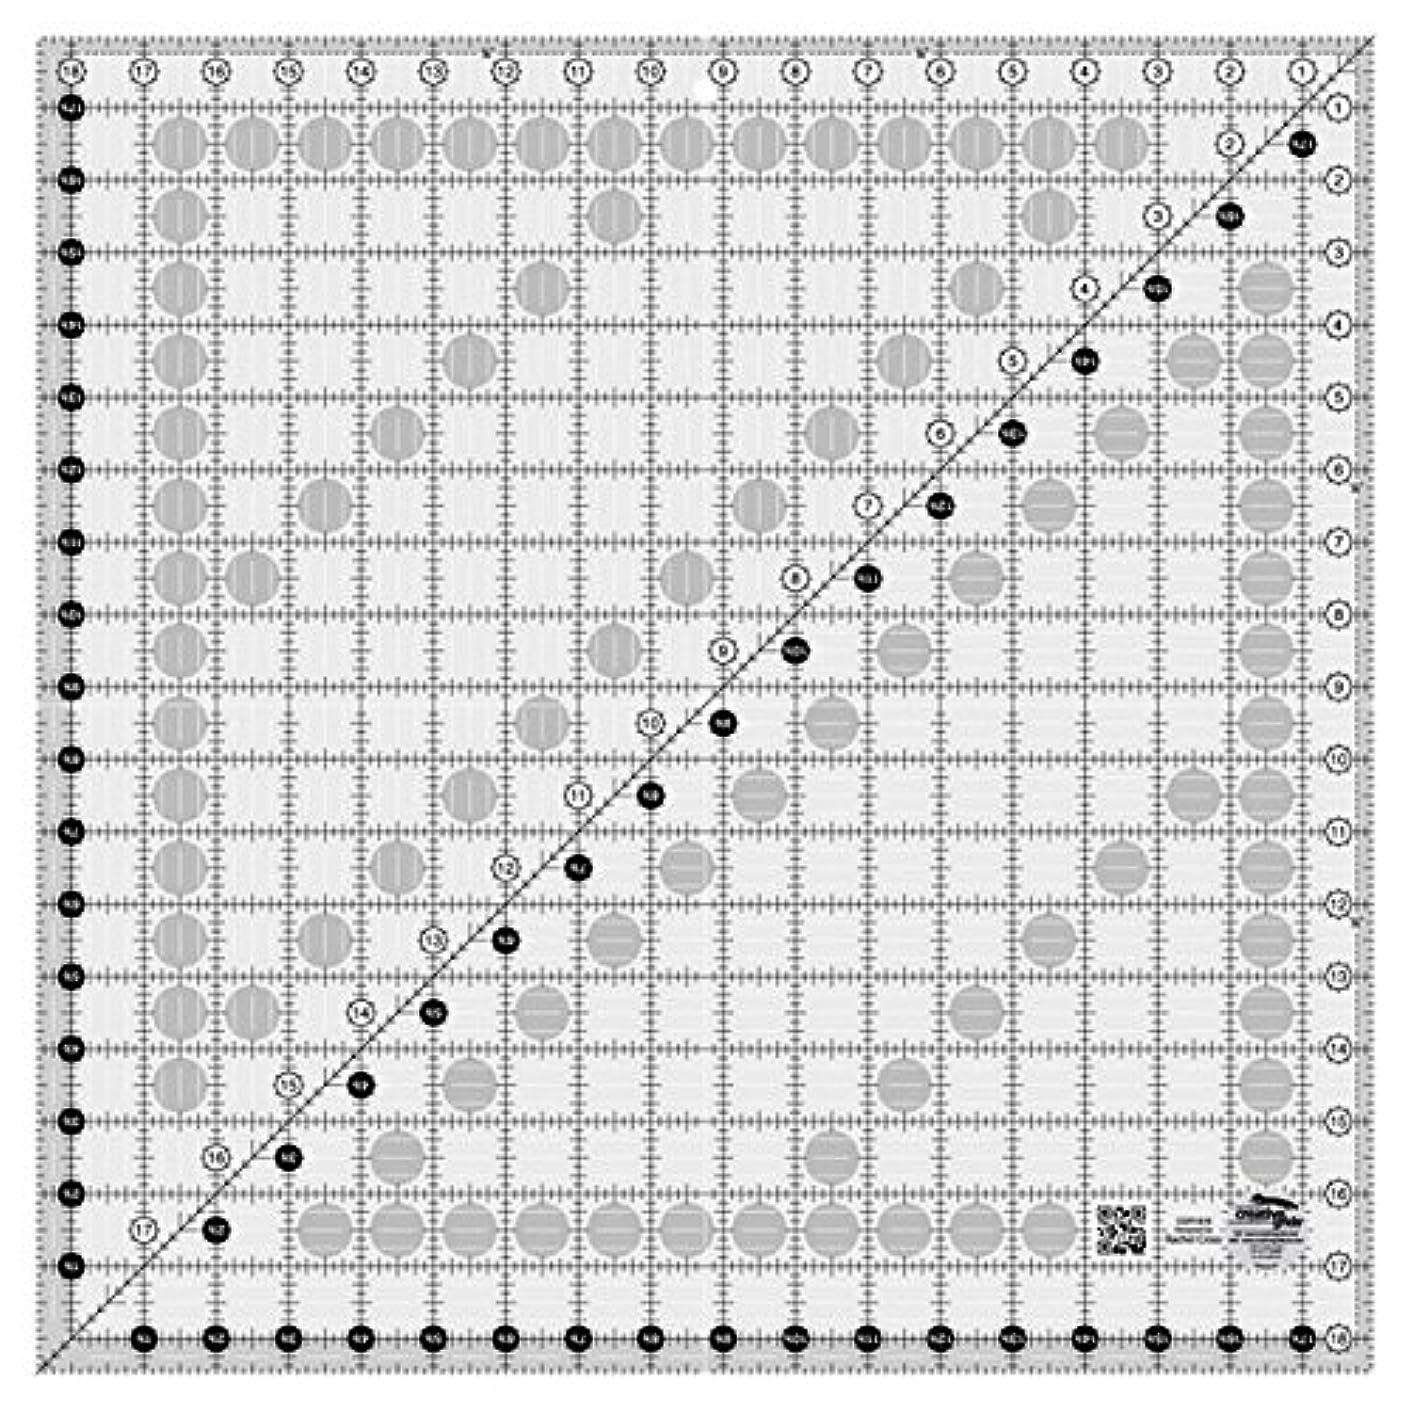 Creative Grids Ruler18.5 Square